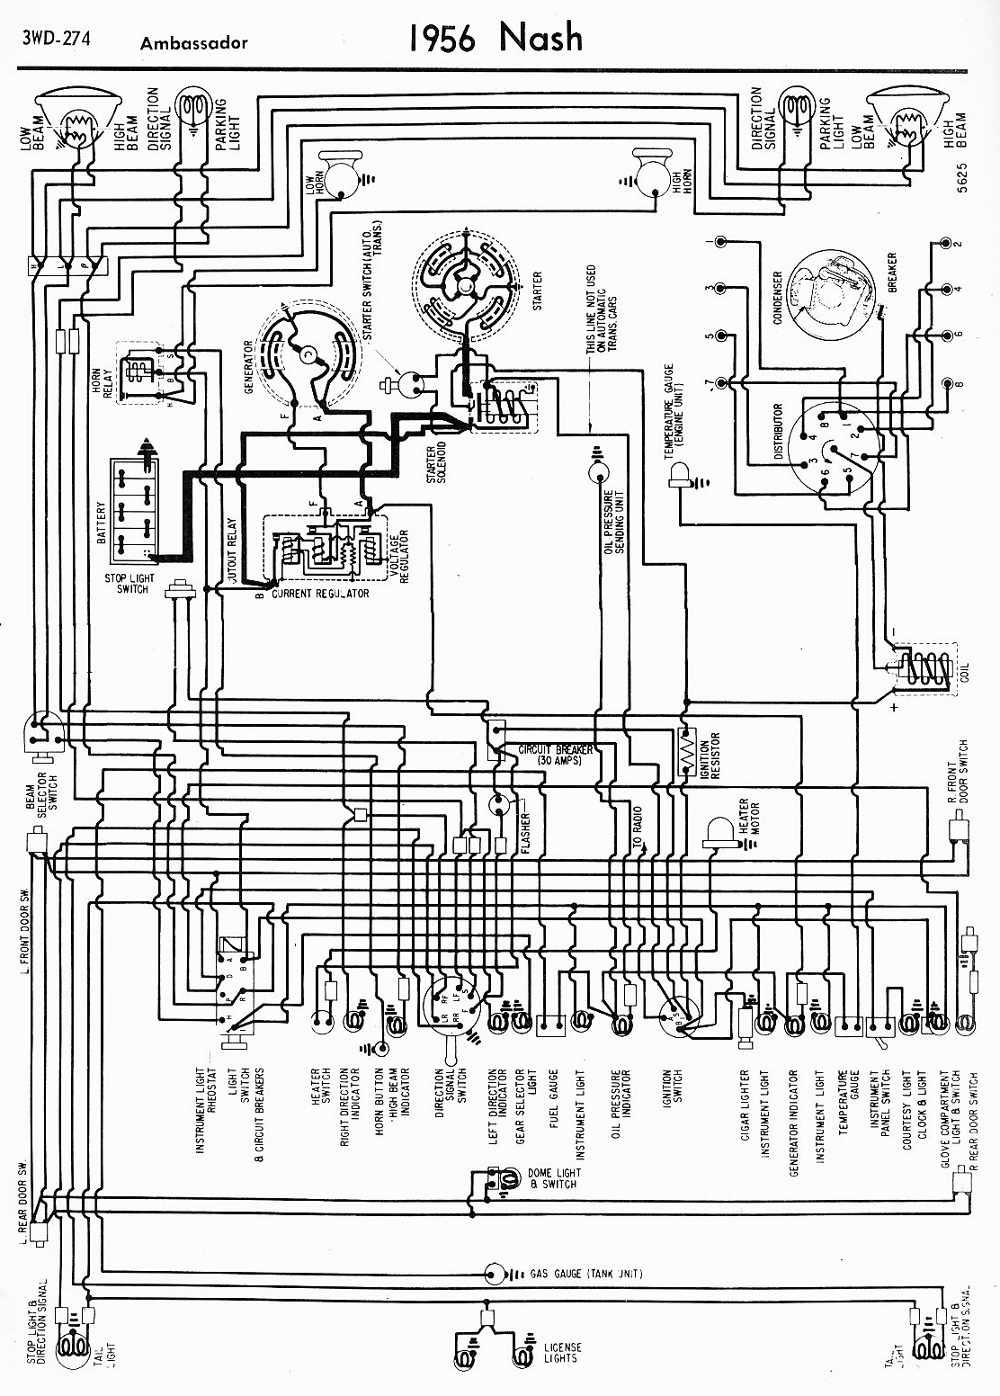 Wiring Diagram For 1950 Nash Libraries Ford Focus Instrument Pdf Car Manuals Diagrams U0026 Fault Codesnash Download